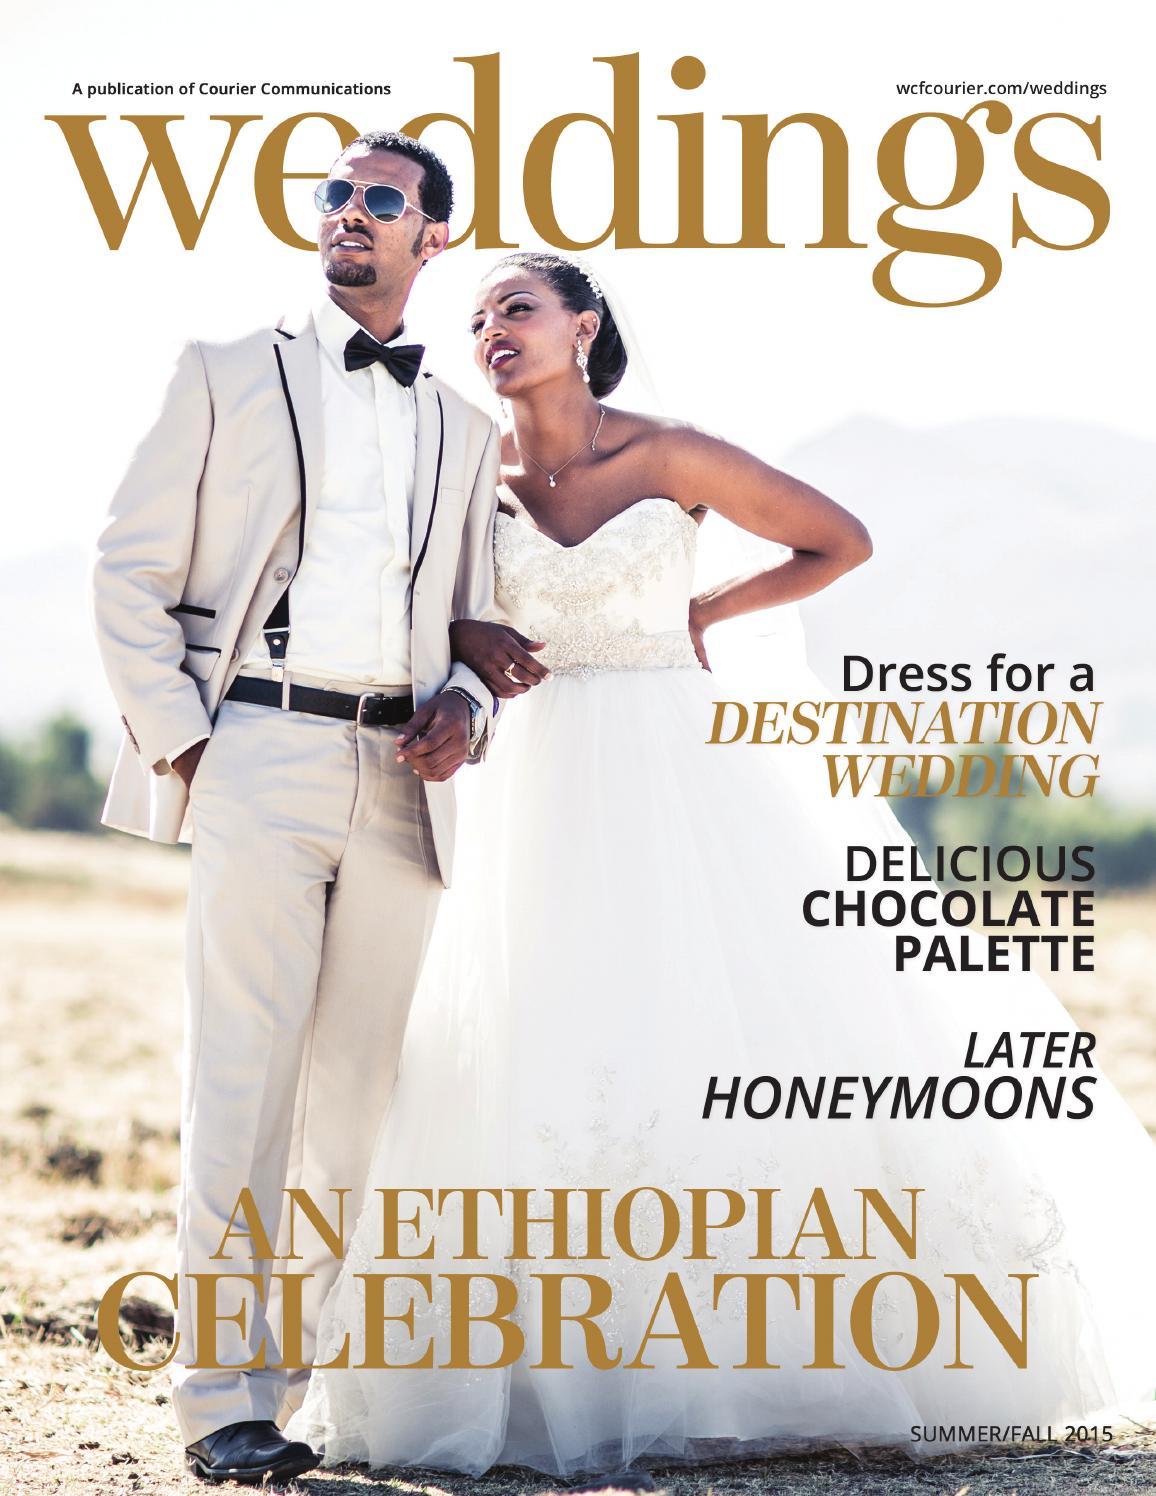 Weddings - Summer/Fall 2015 by Waterloo-Cedar Falls Courier - issuu